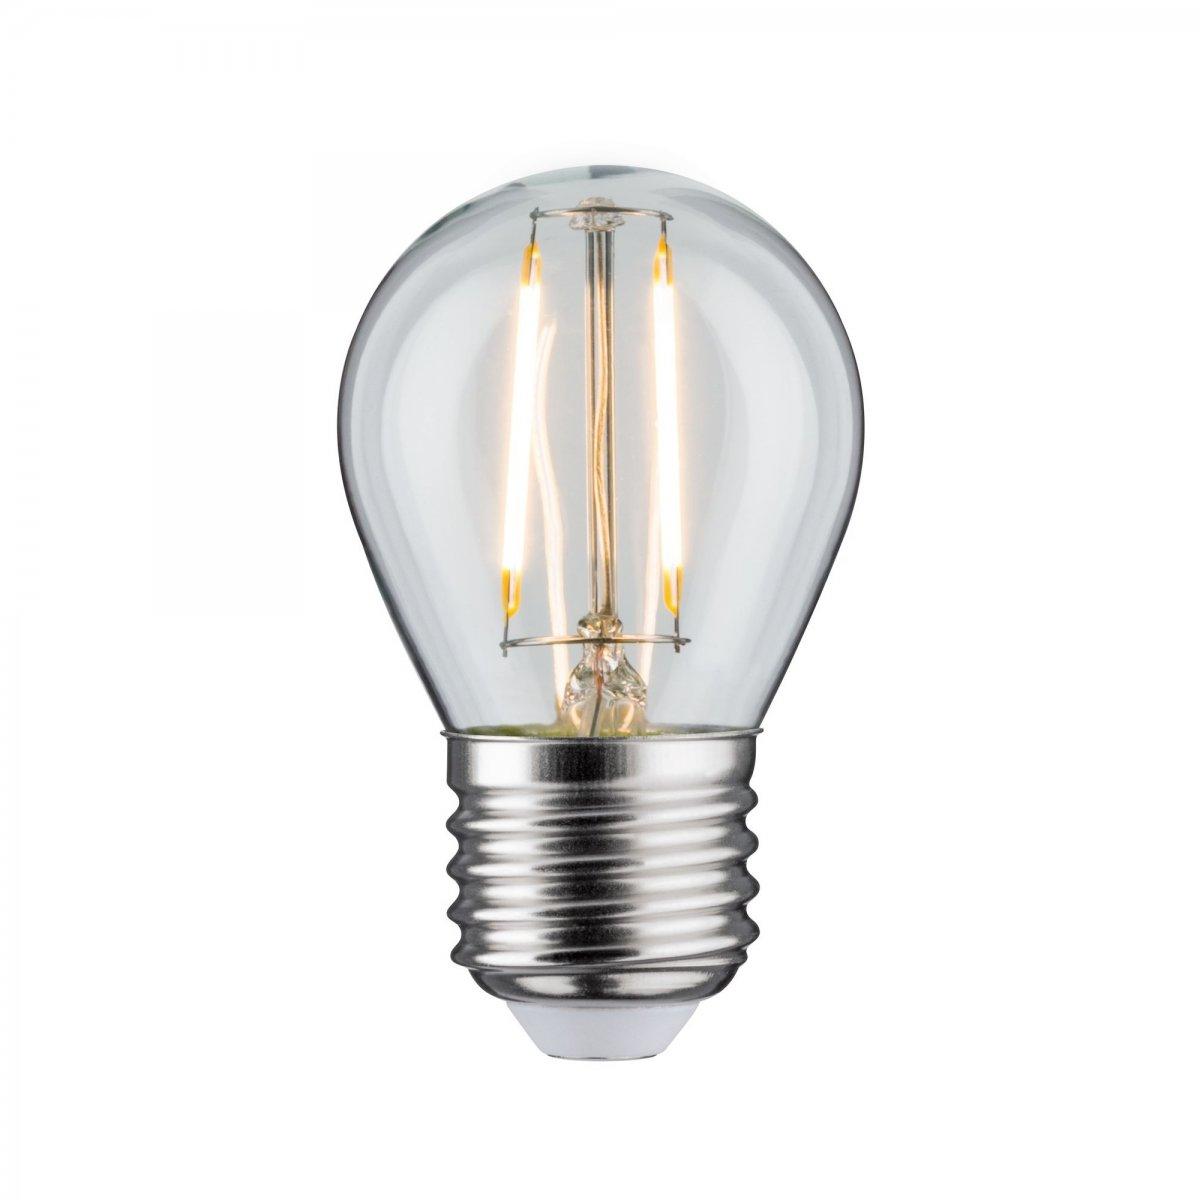 Retro Lampen Led : Thepinwitch led lampe retro chip bajonett ablaze no ghosting